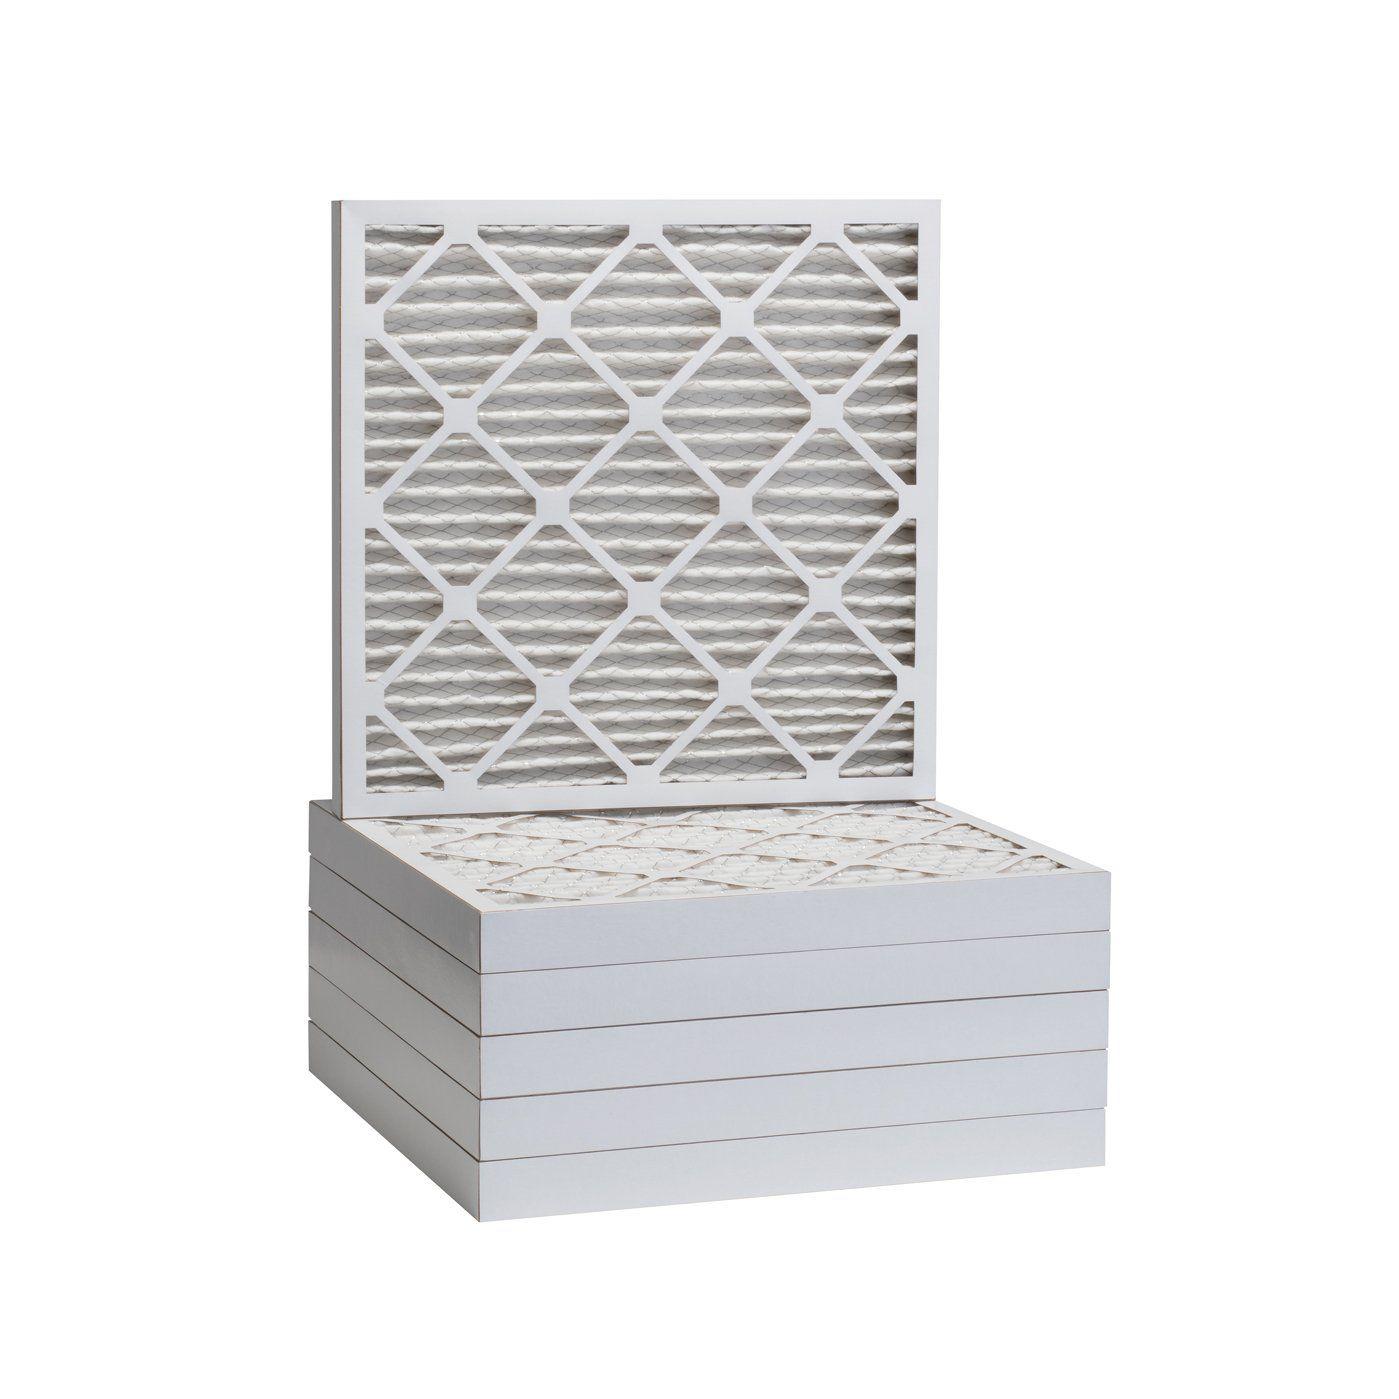 20x20x2 Ultimate MERV 13 Air Filter/Furnace Filter